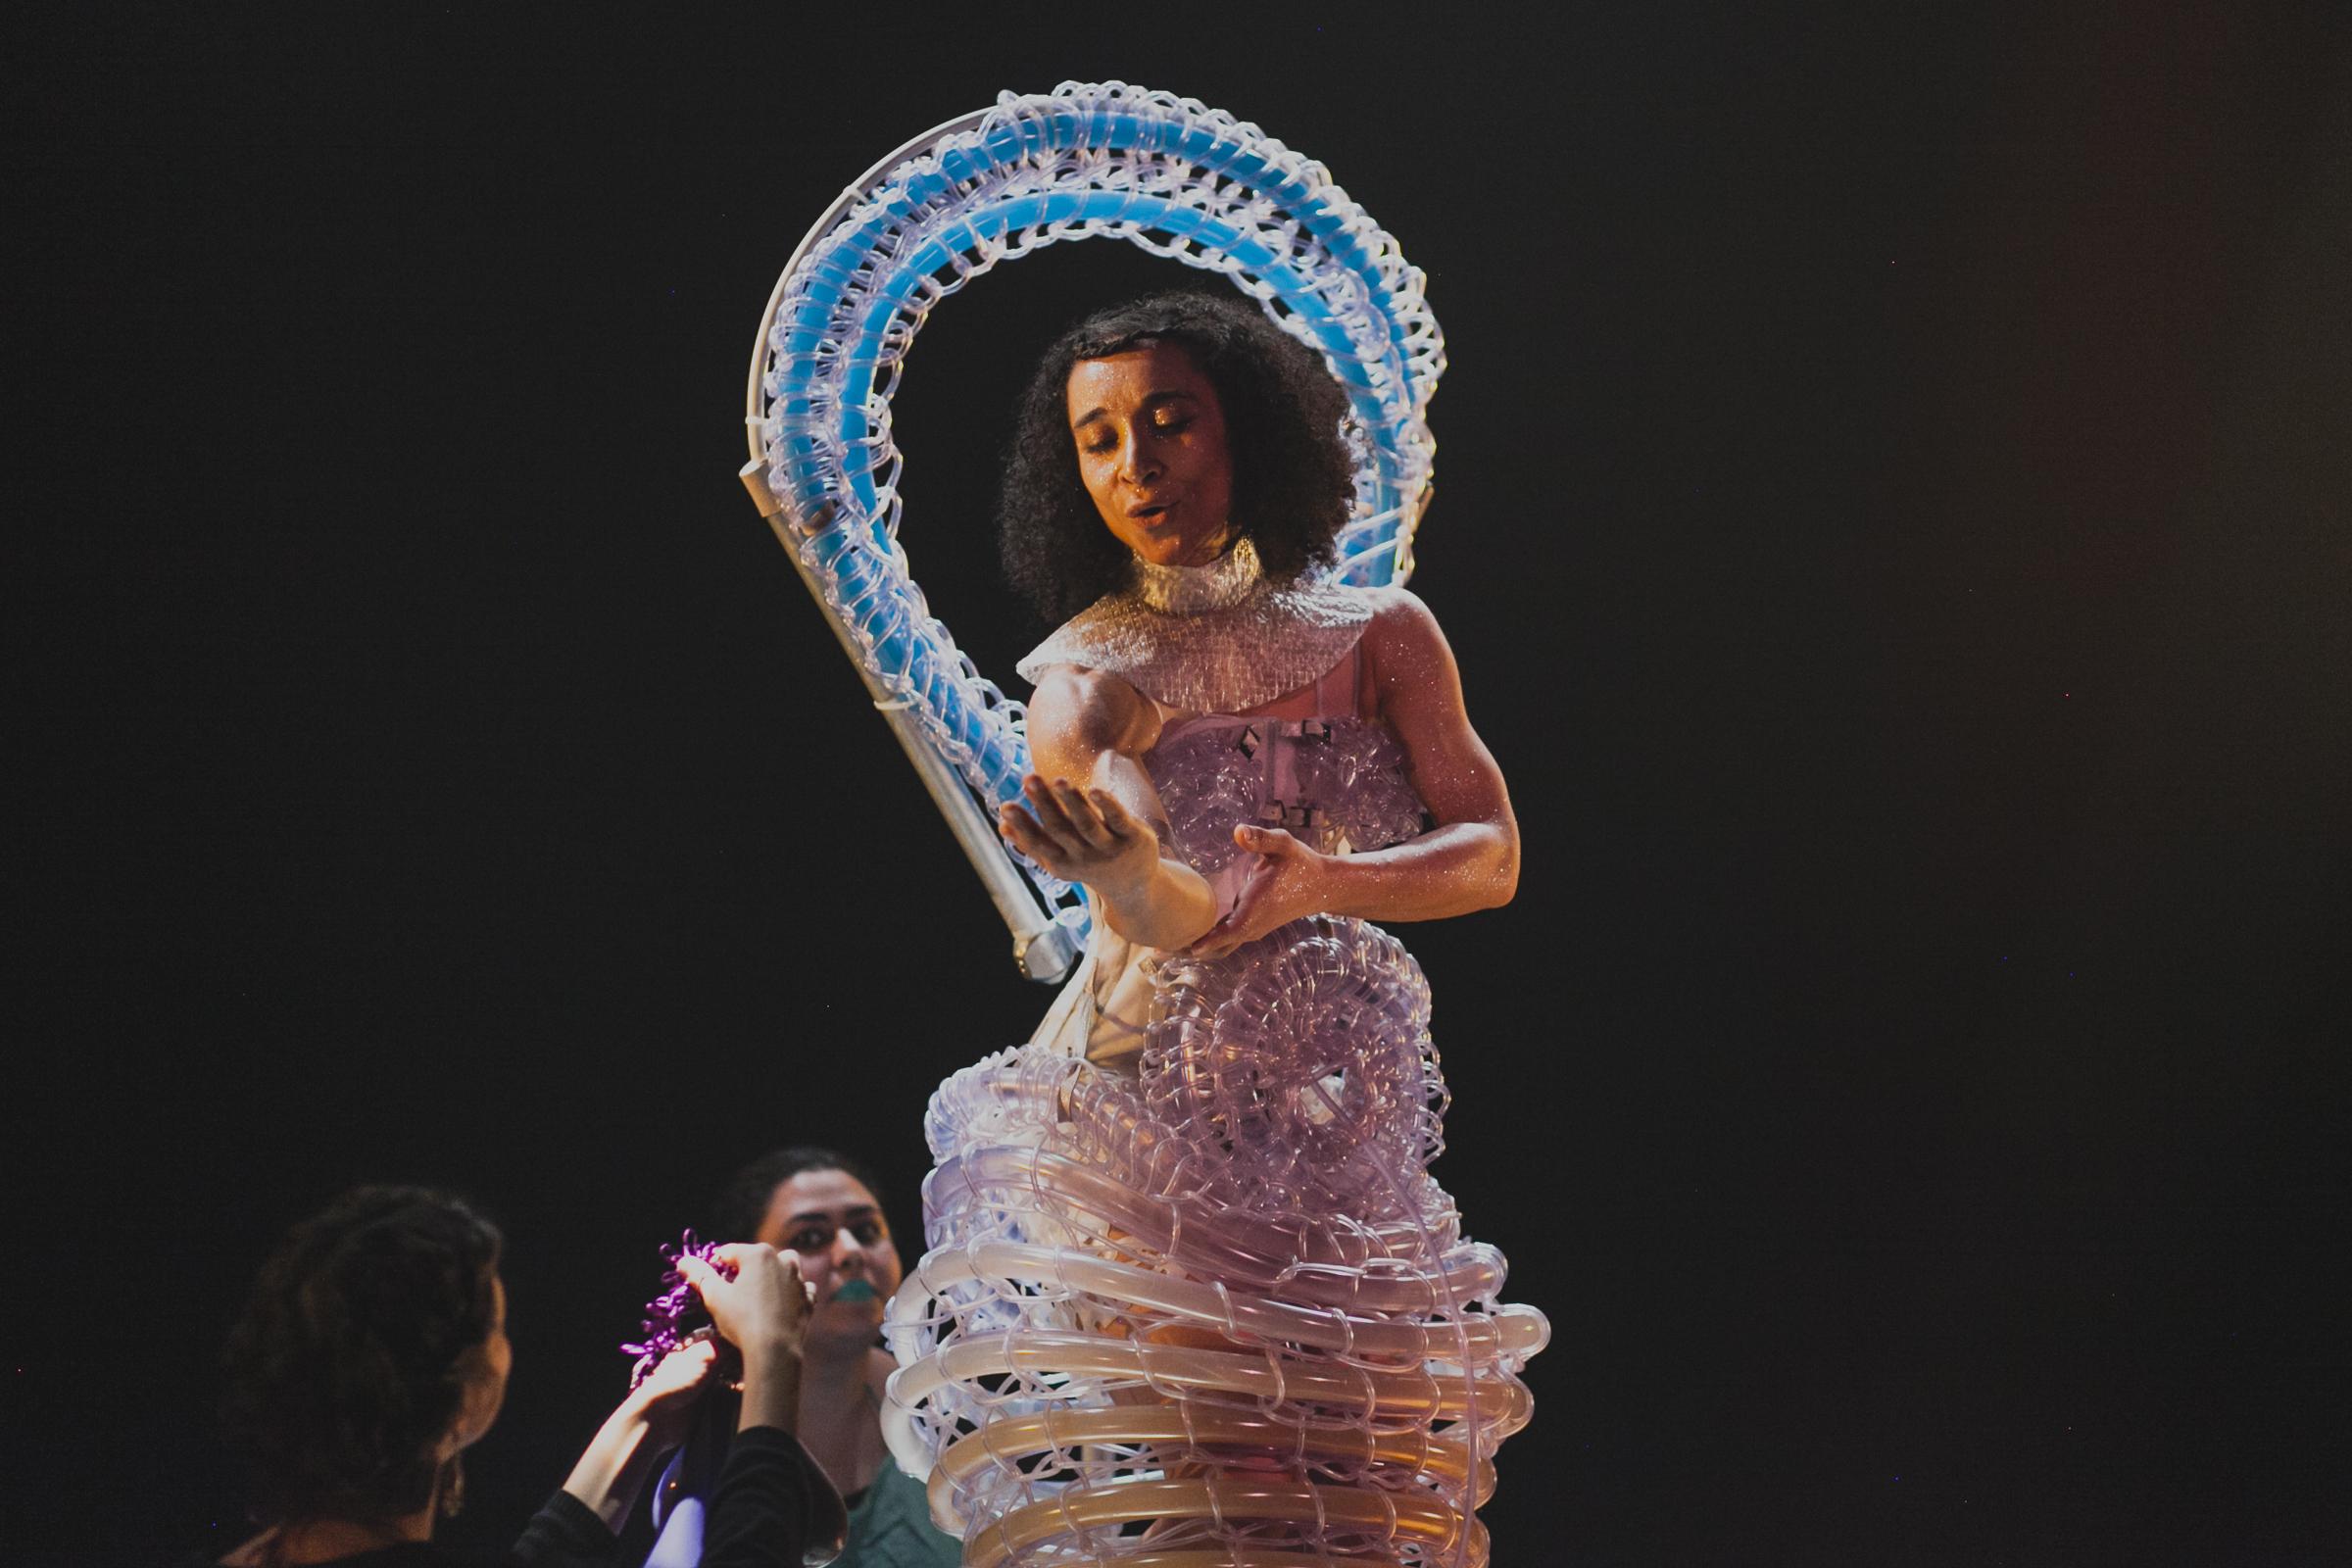 LCFMA19-CostumeShow-GabrielaLotaif-44.jpg